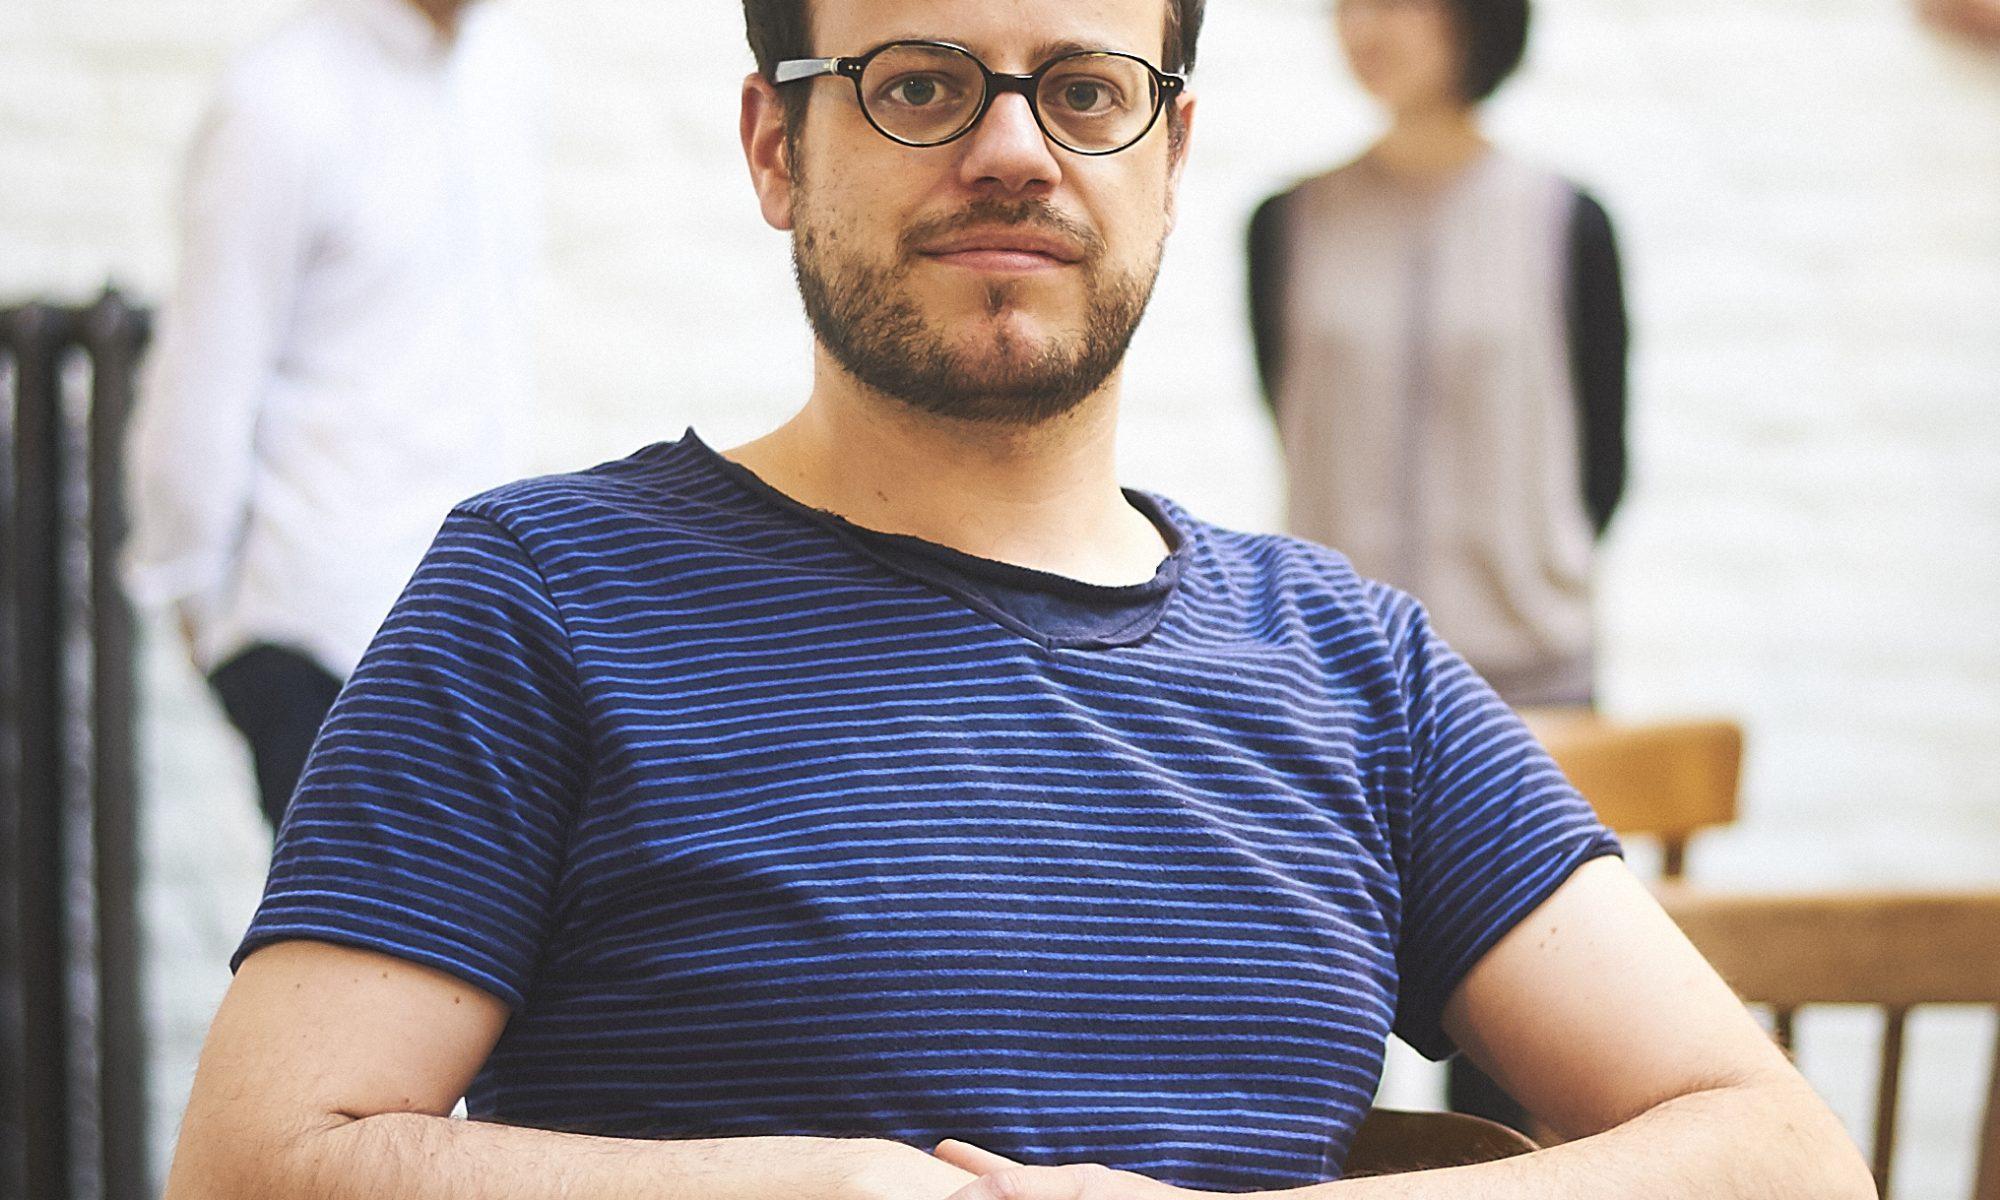 Philippe Koerper